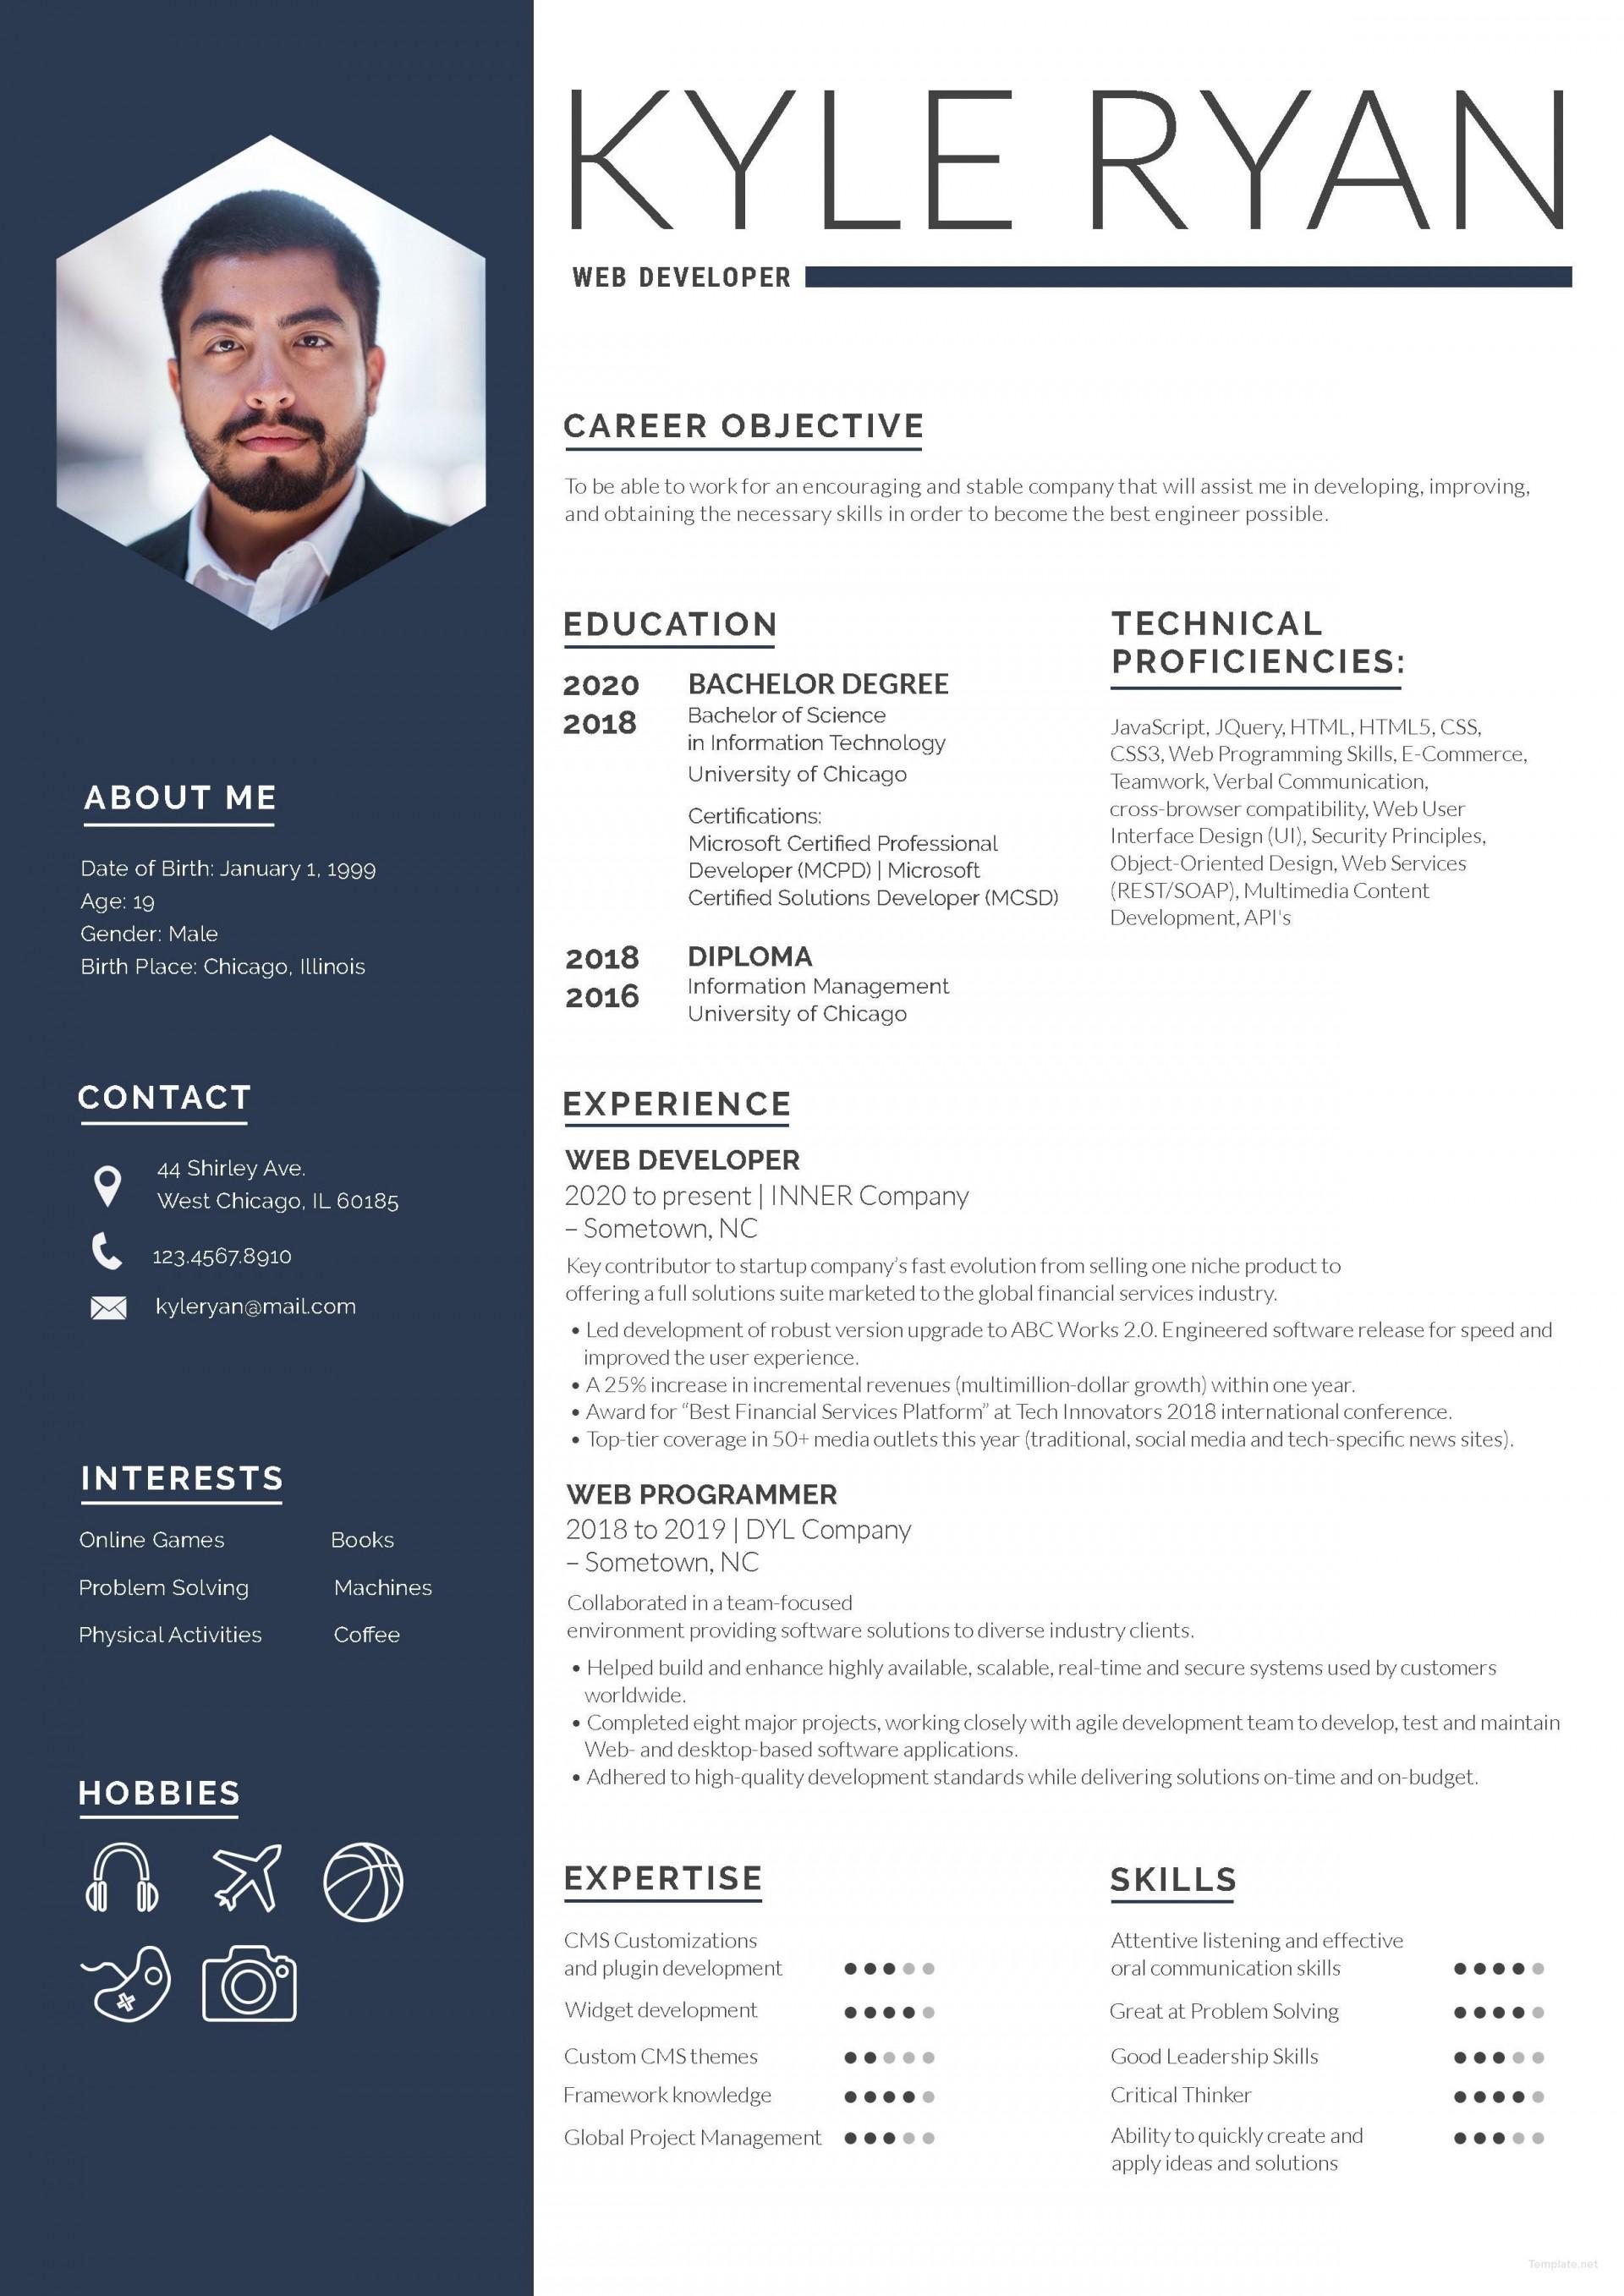 003 Unusual Free Resume Template 2018 Printable Highest Clarity 1920